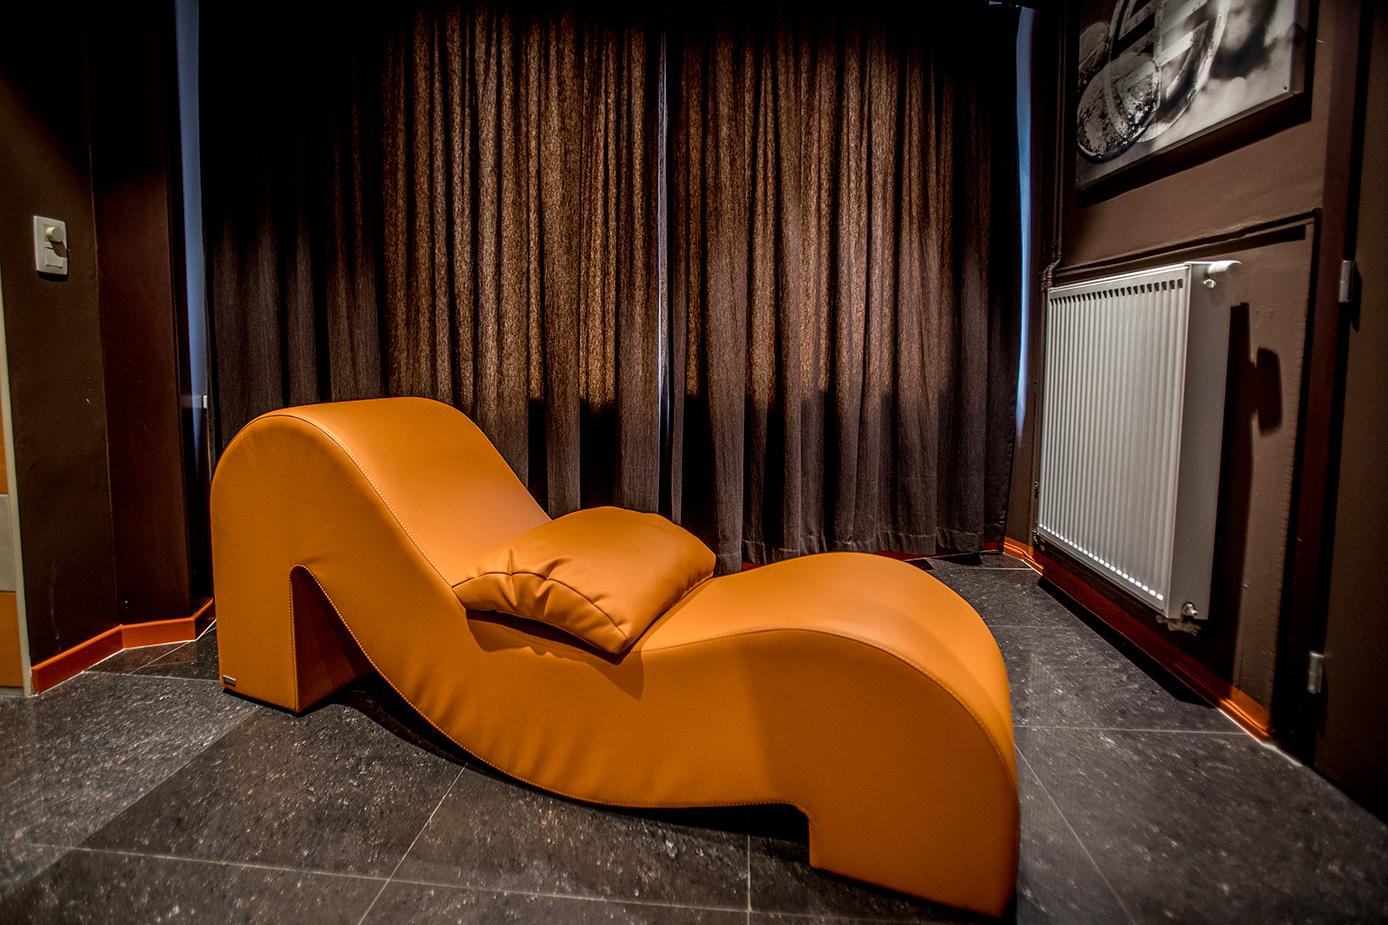 Ptitamie-rendezvous-hotelkamer-tantra-chair-4.jpg